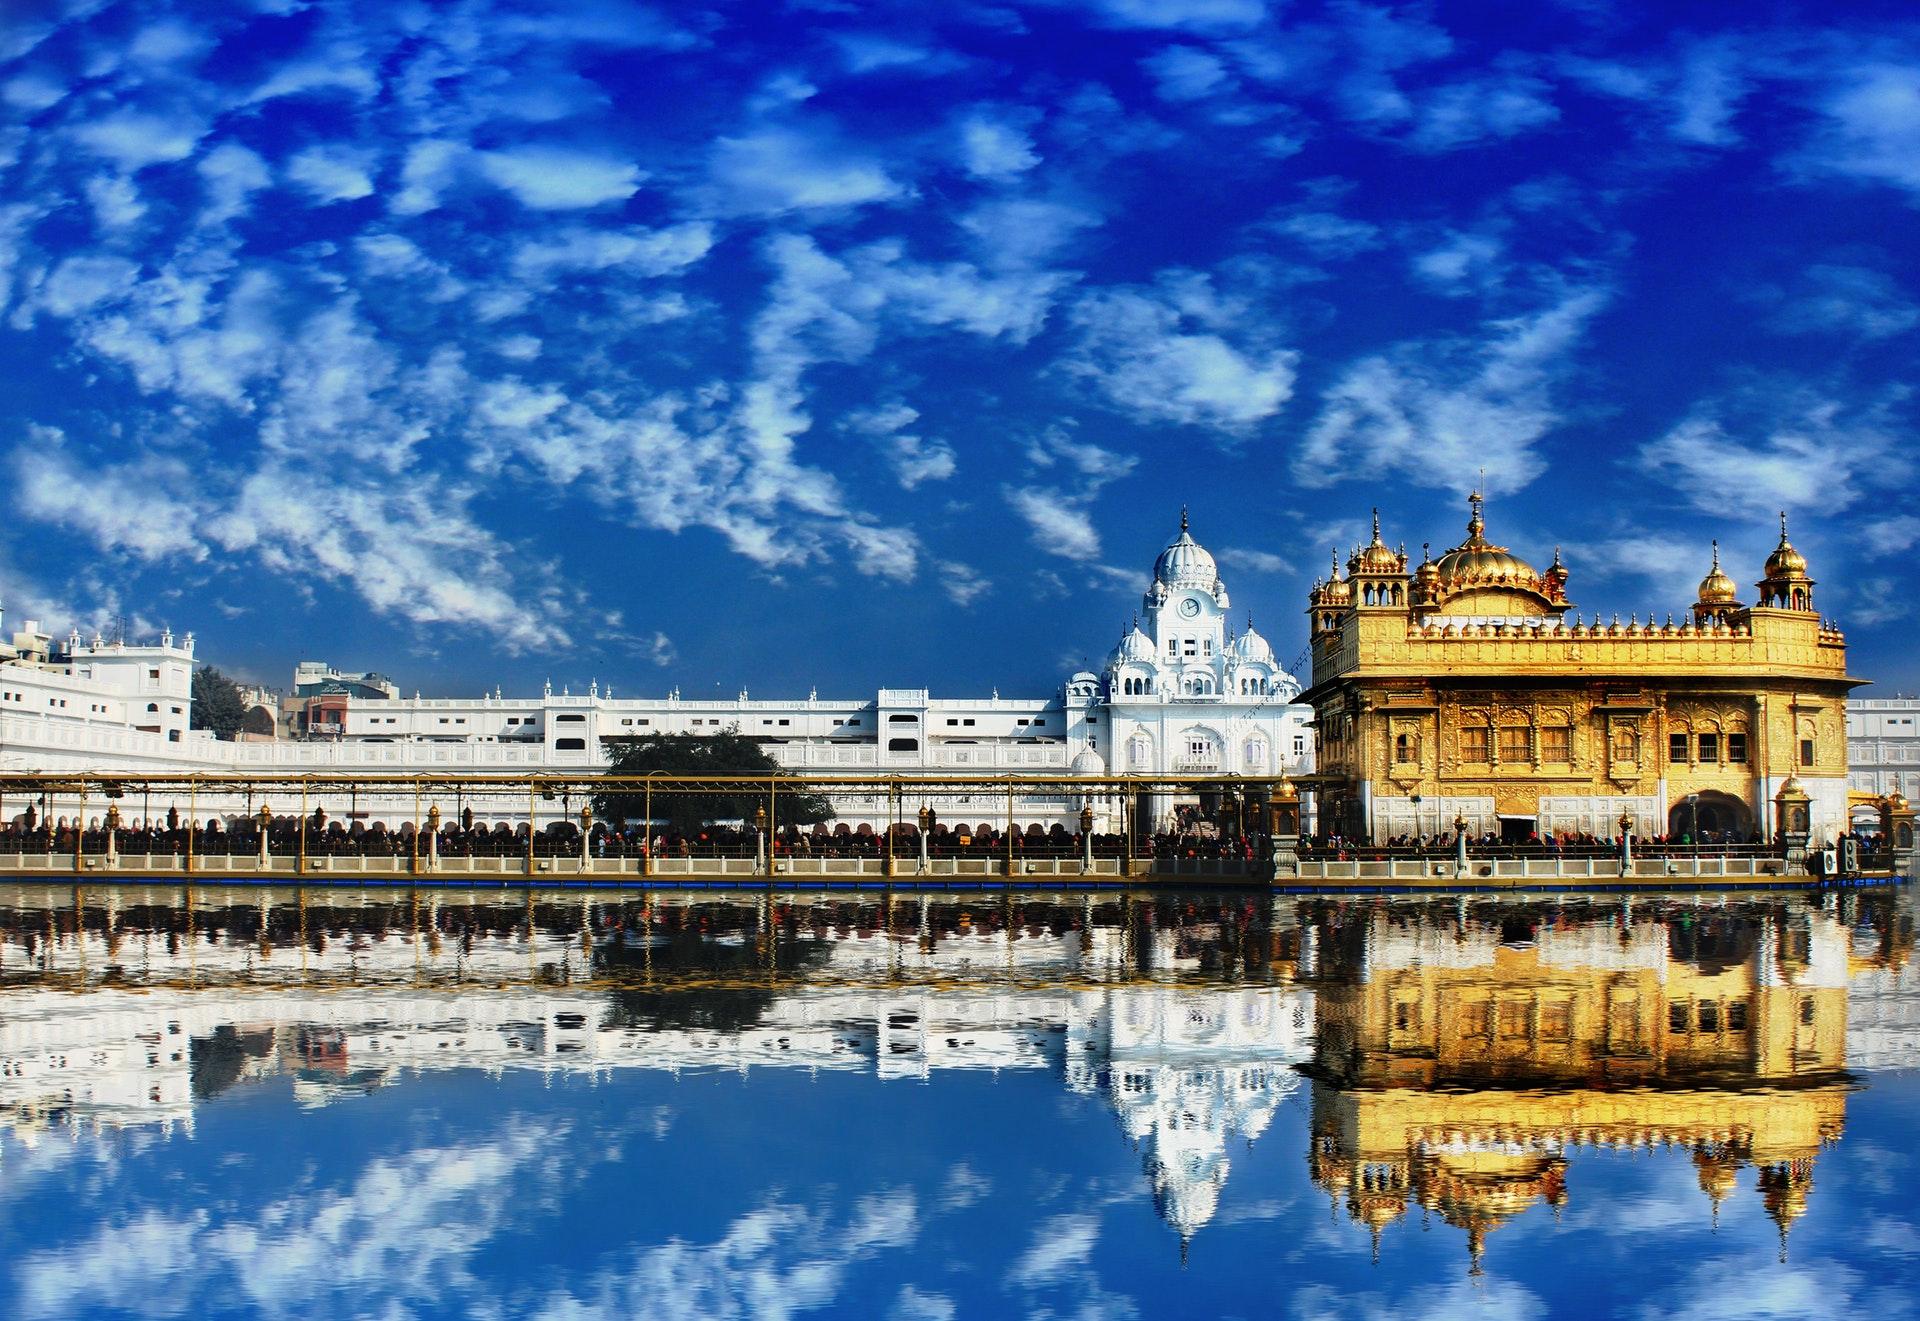 Turismo y magia de India